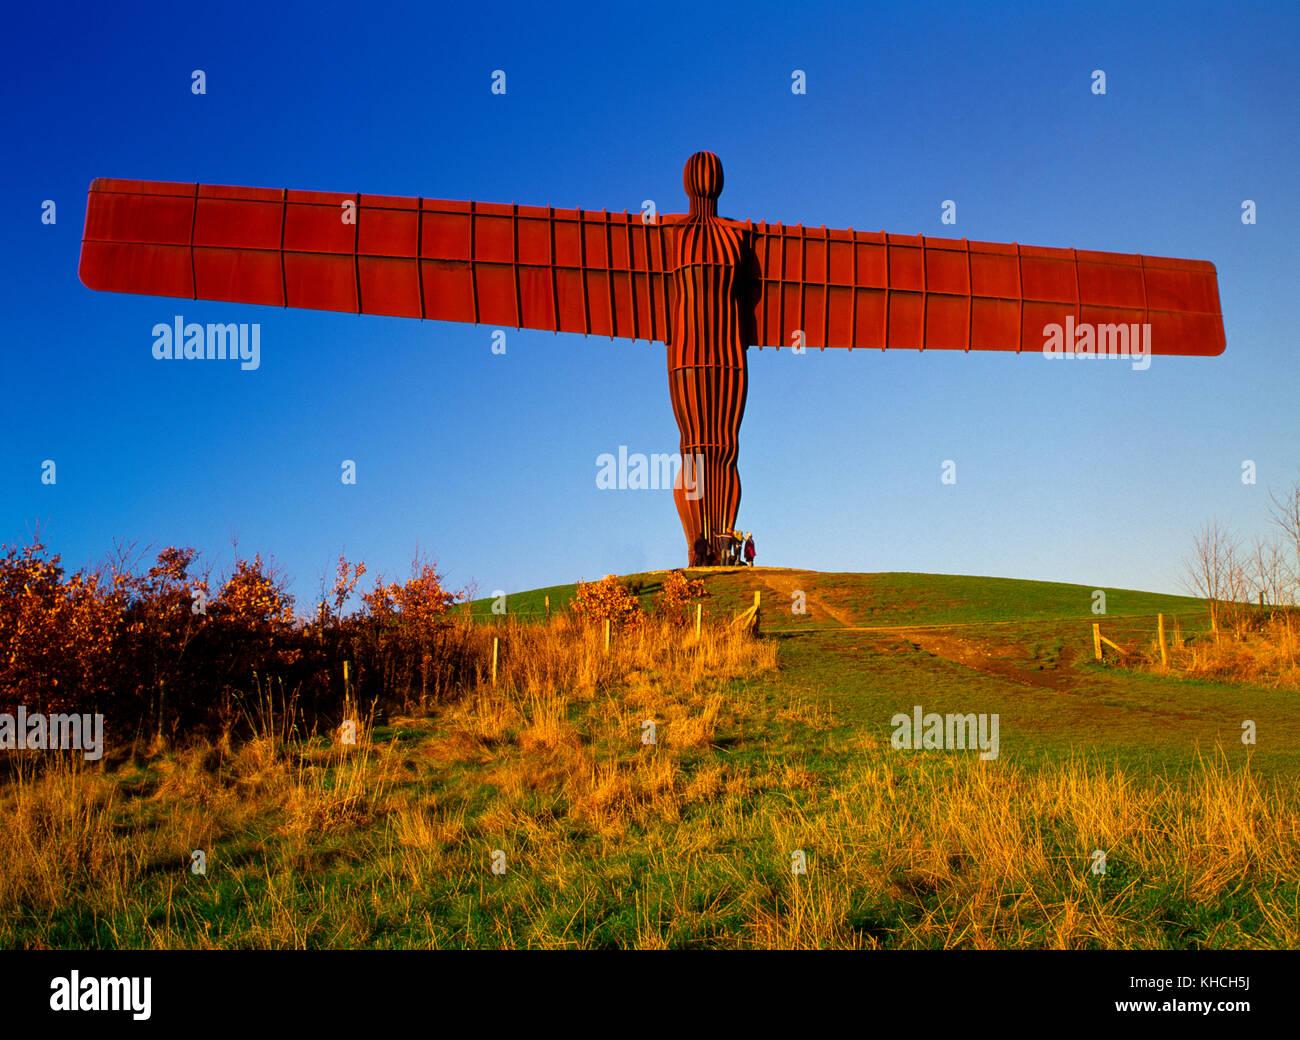 Angel of the North statue, Gateshead, Tyne and Wear, England, UK - Stock Image